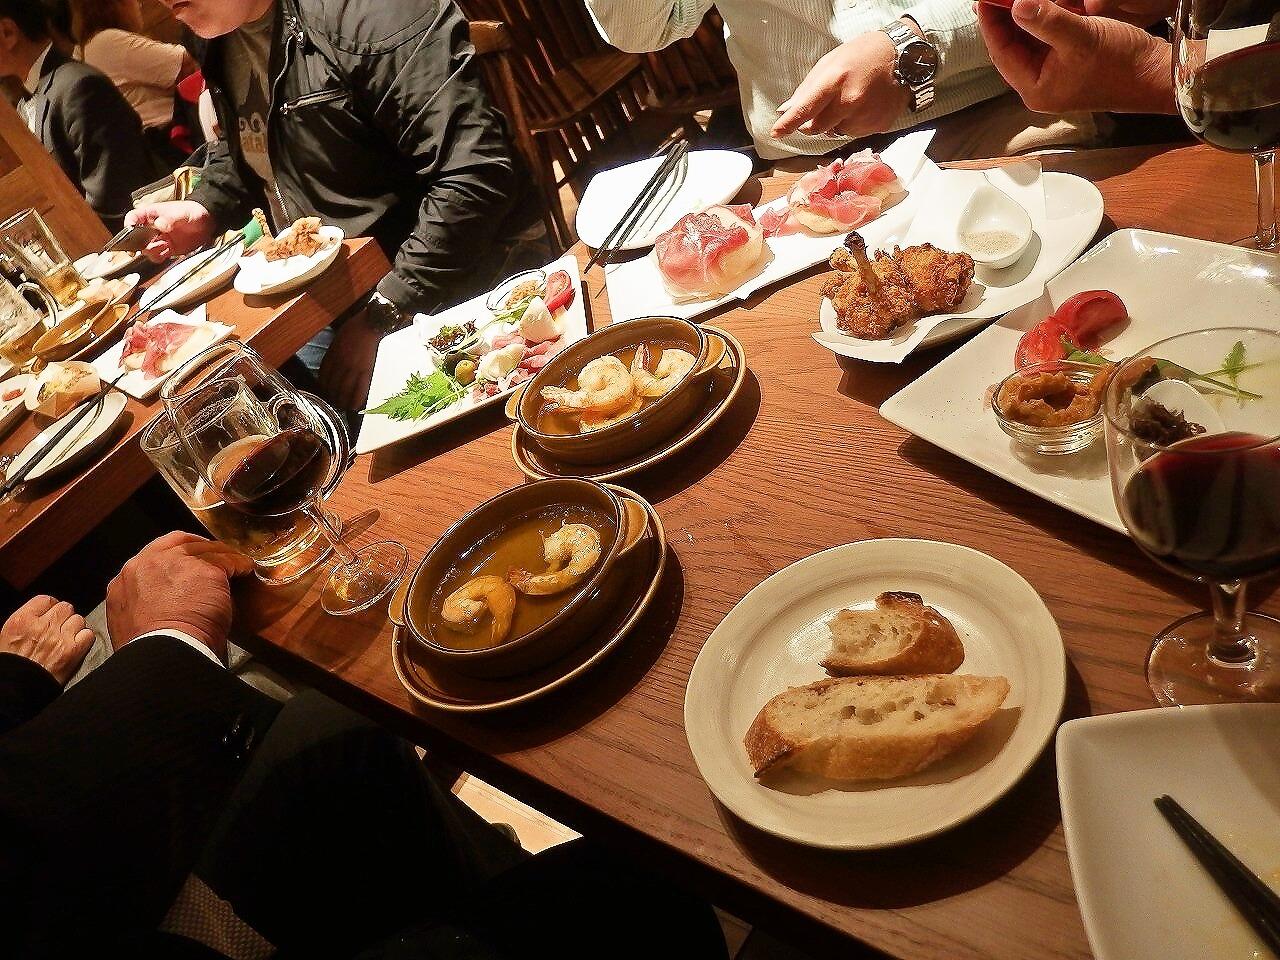 s-foodpic6834069.jpg